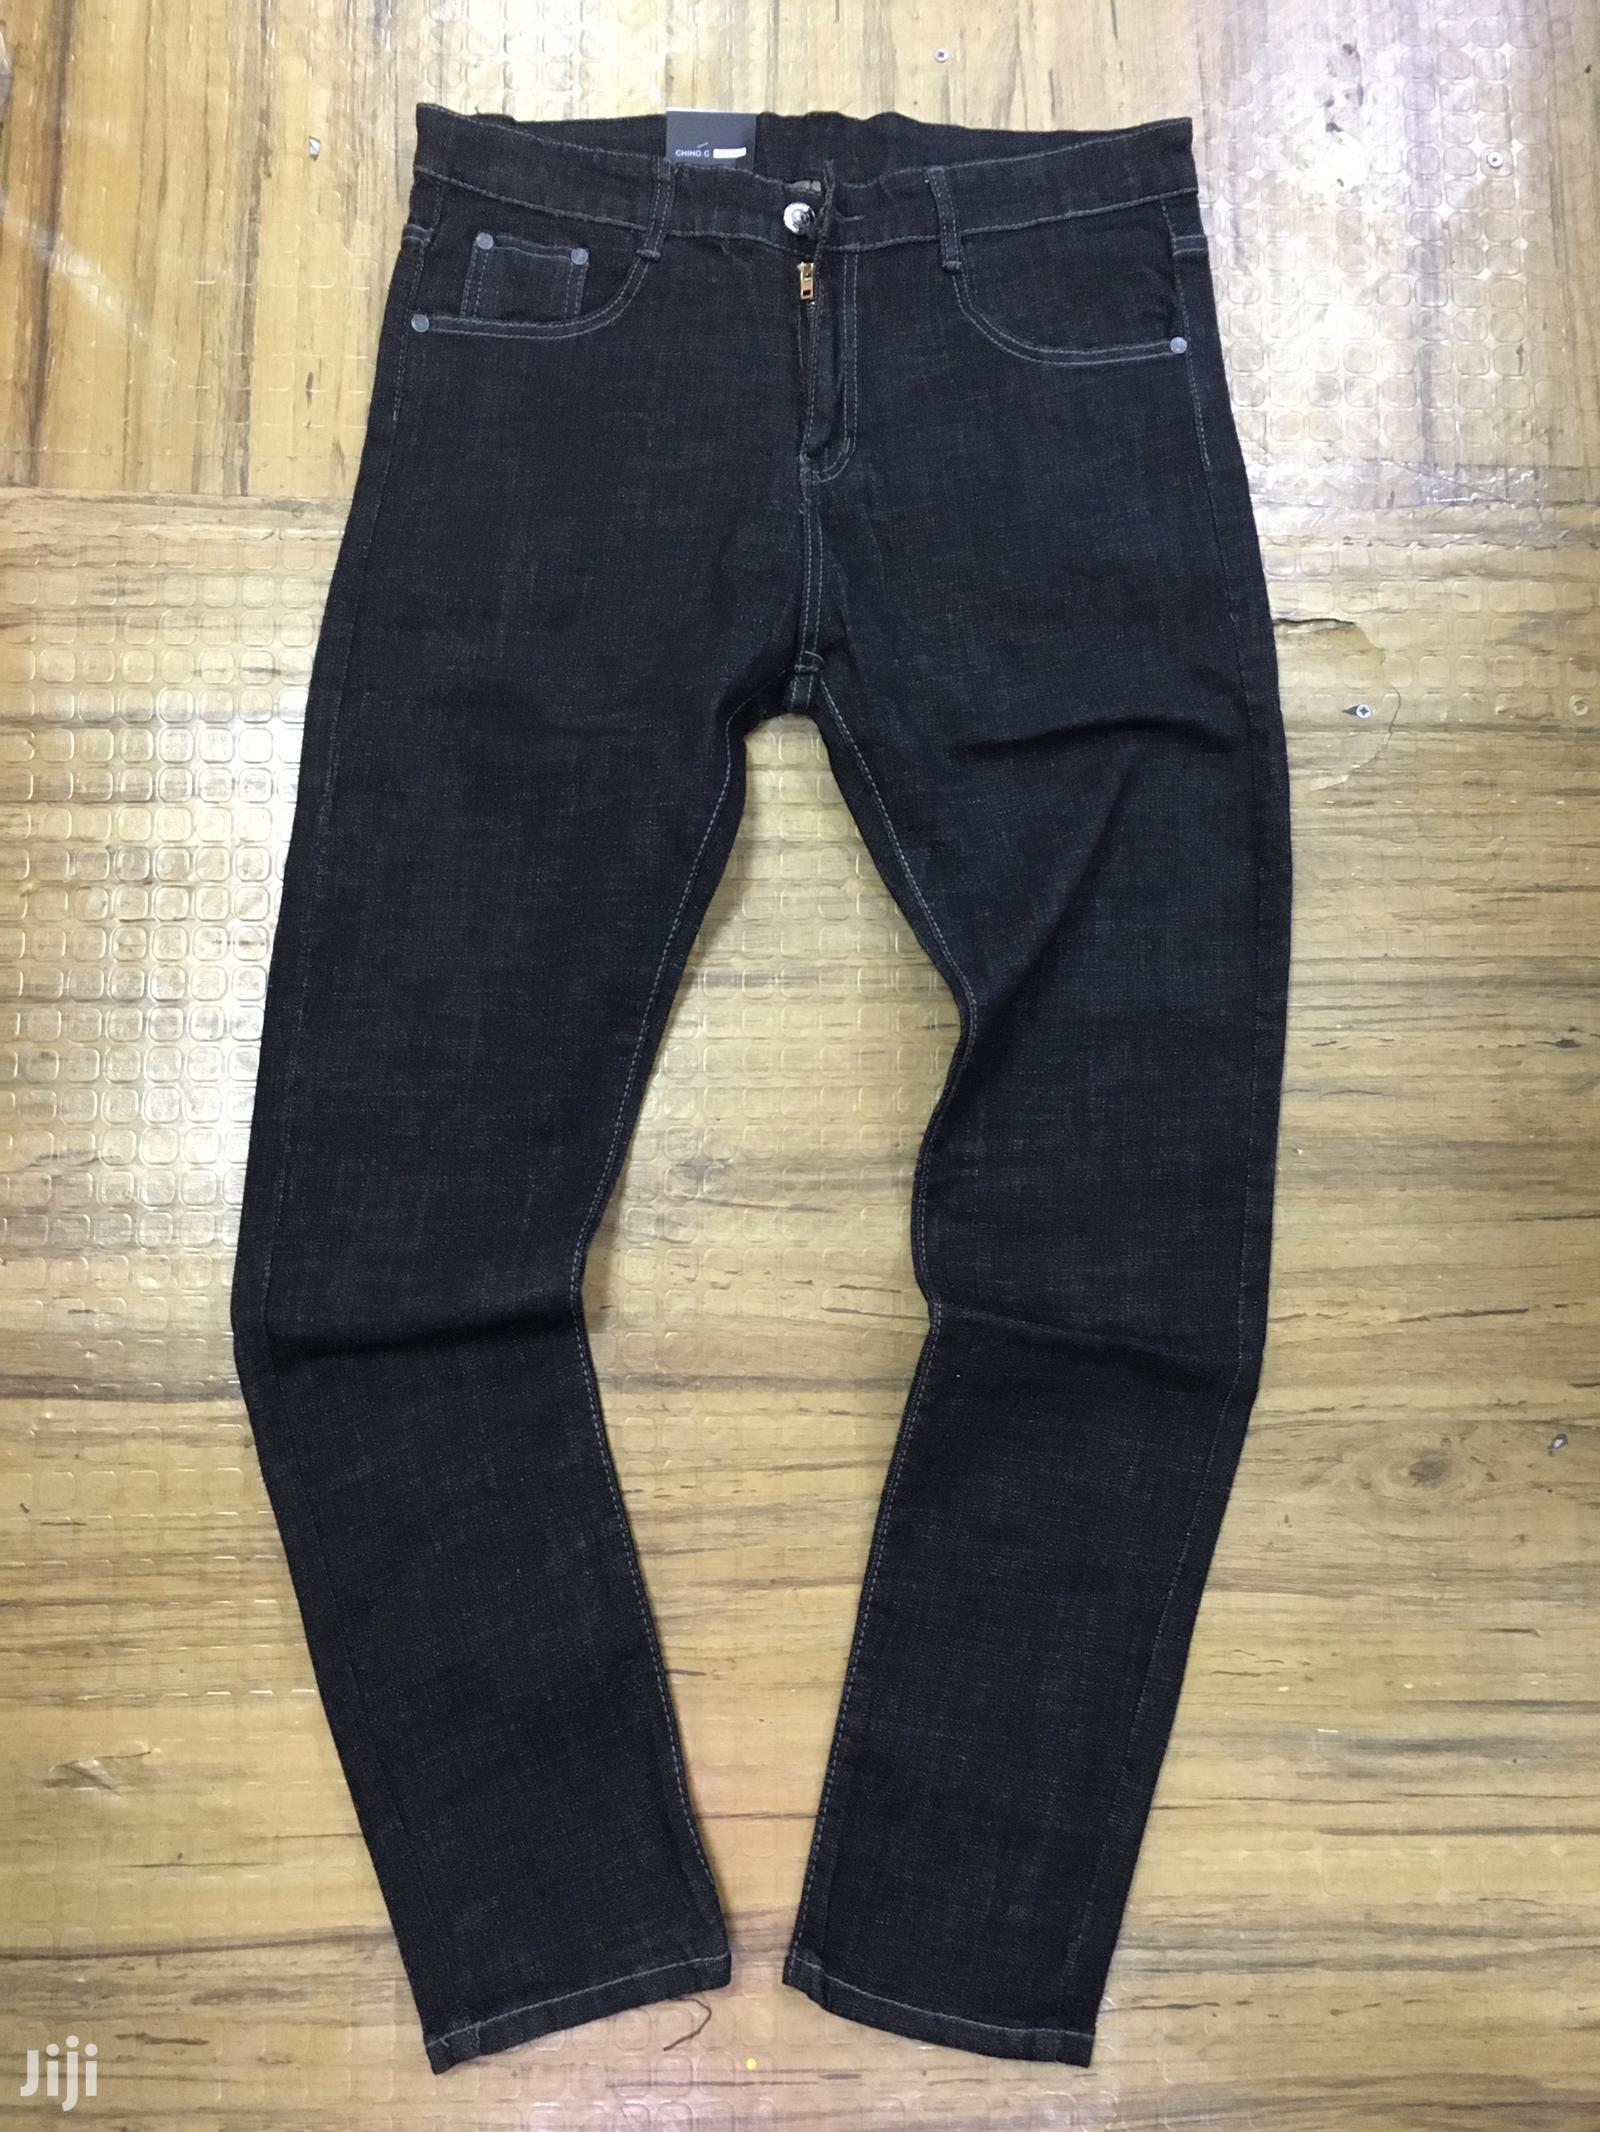 Quality Jeans | Clothing for sale in Nairobi Central, Nairobi, Kenya